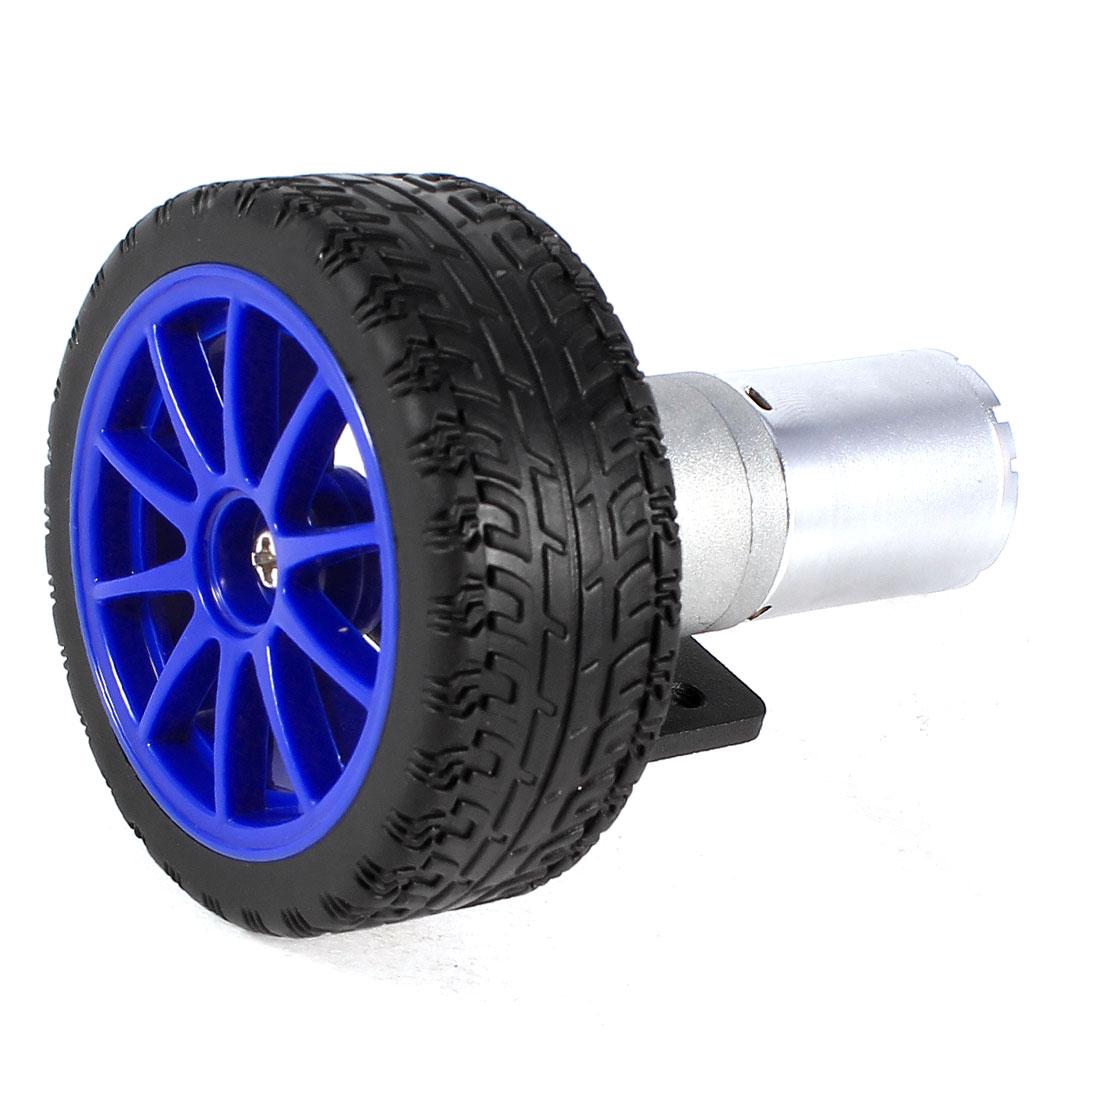 4 in 1 DC Reducing Motor + Bracket + Tyre Tire Wheel + Hex Coupler for Smart Car